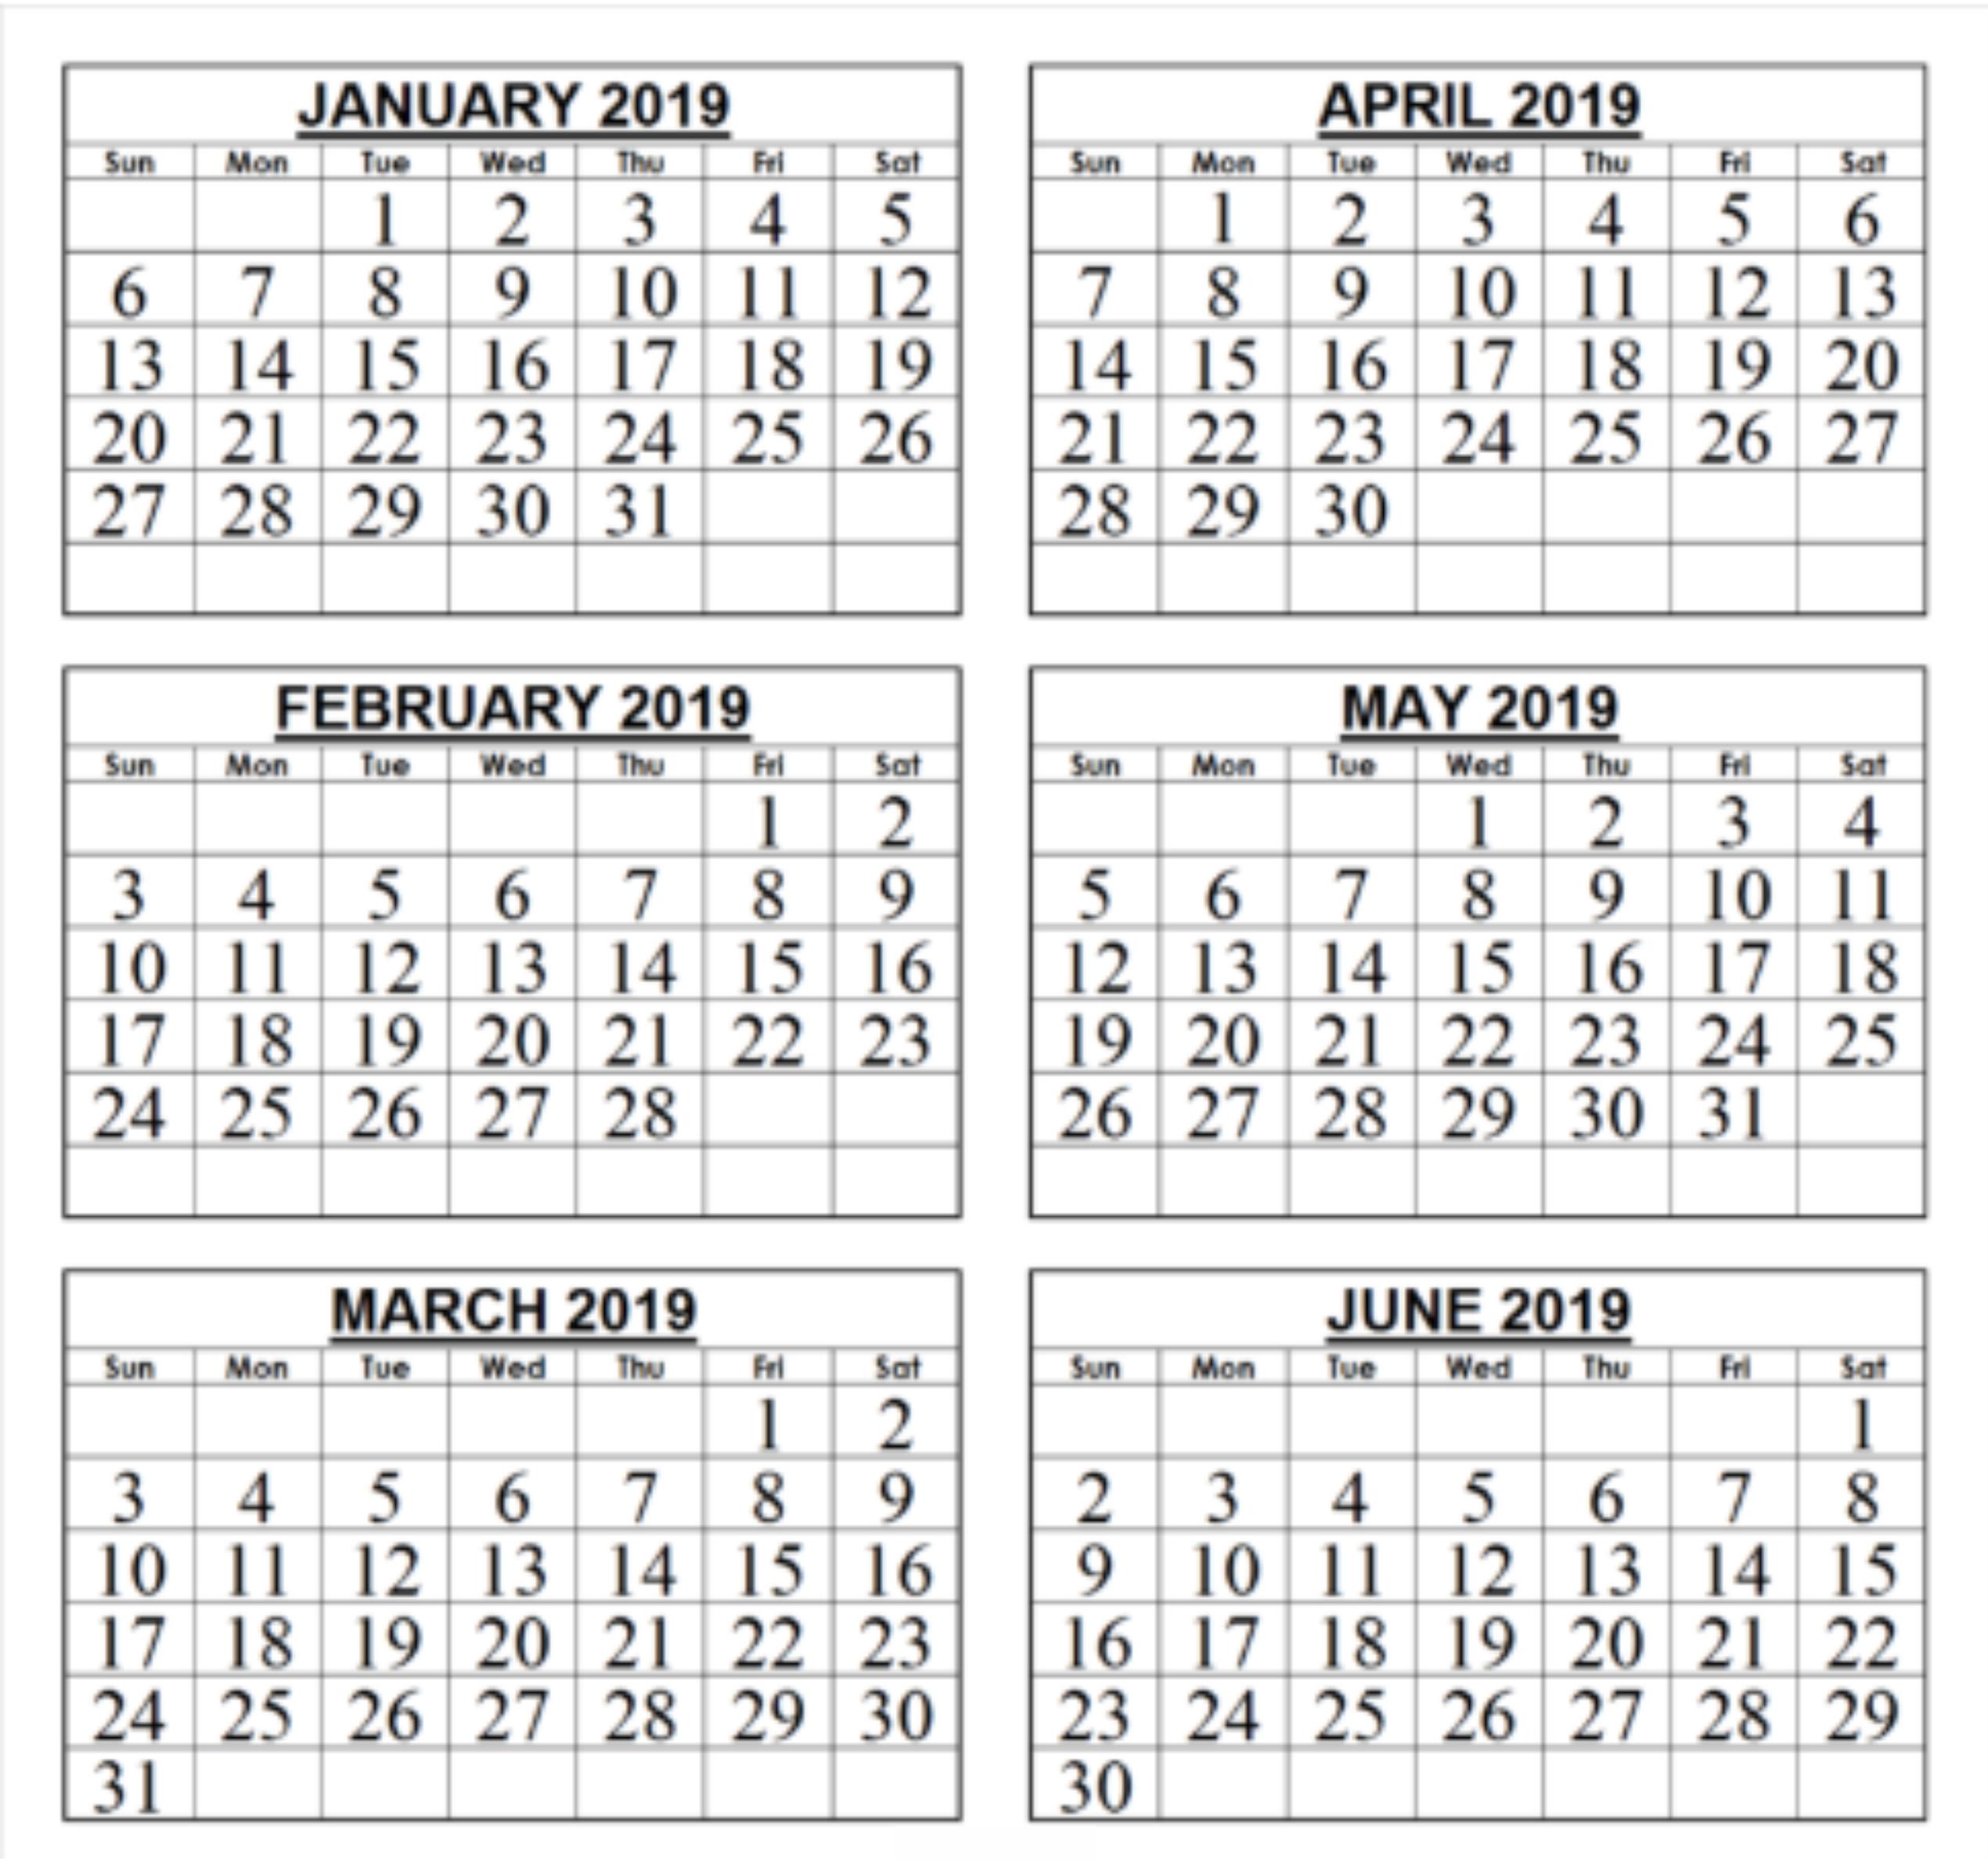 Calendar 6 Month 2019 • Printable Blank Calendar Template Printable Calendar 2019 6 Months